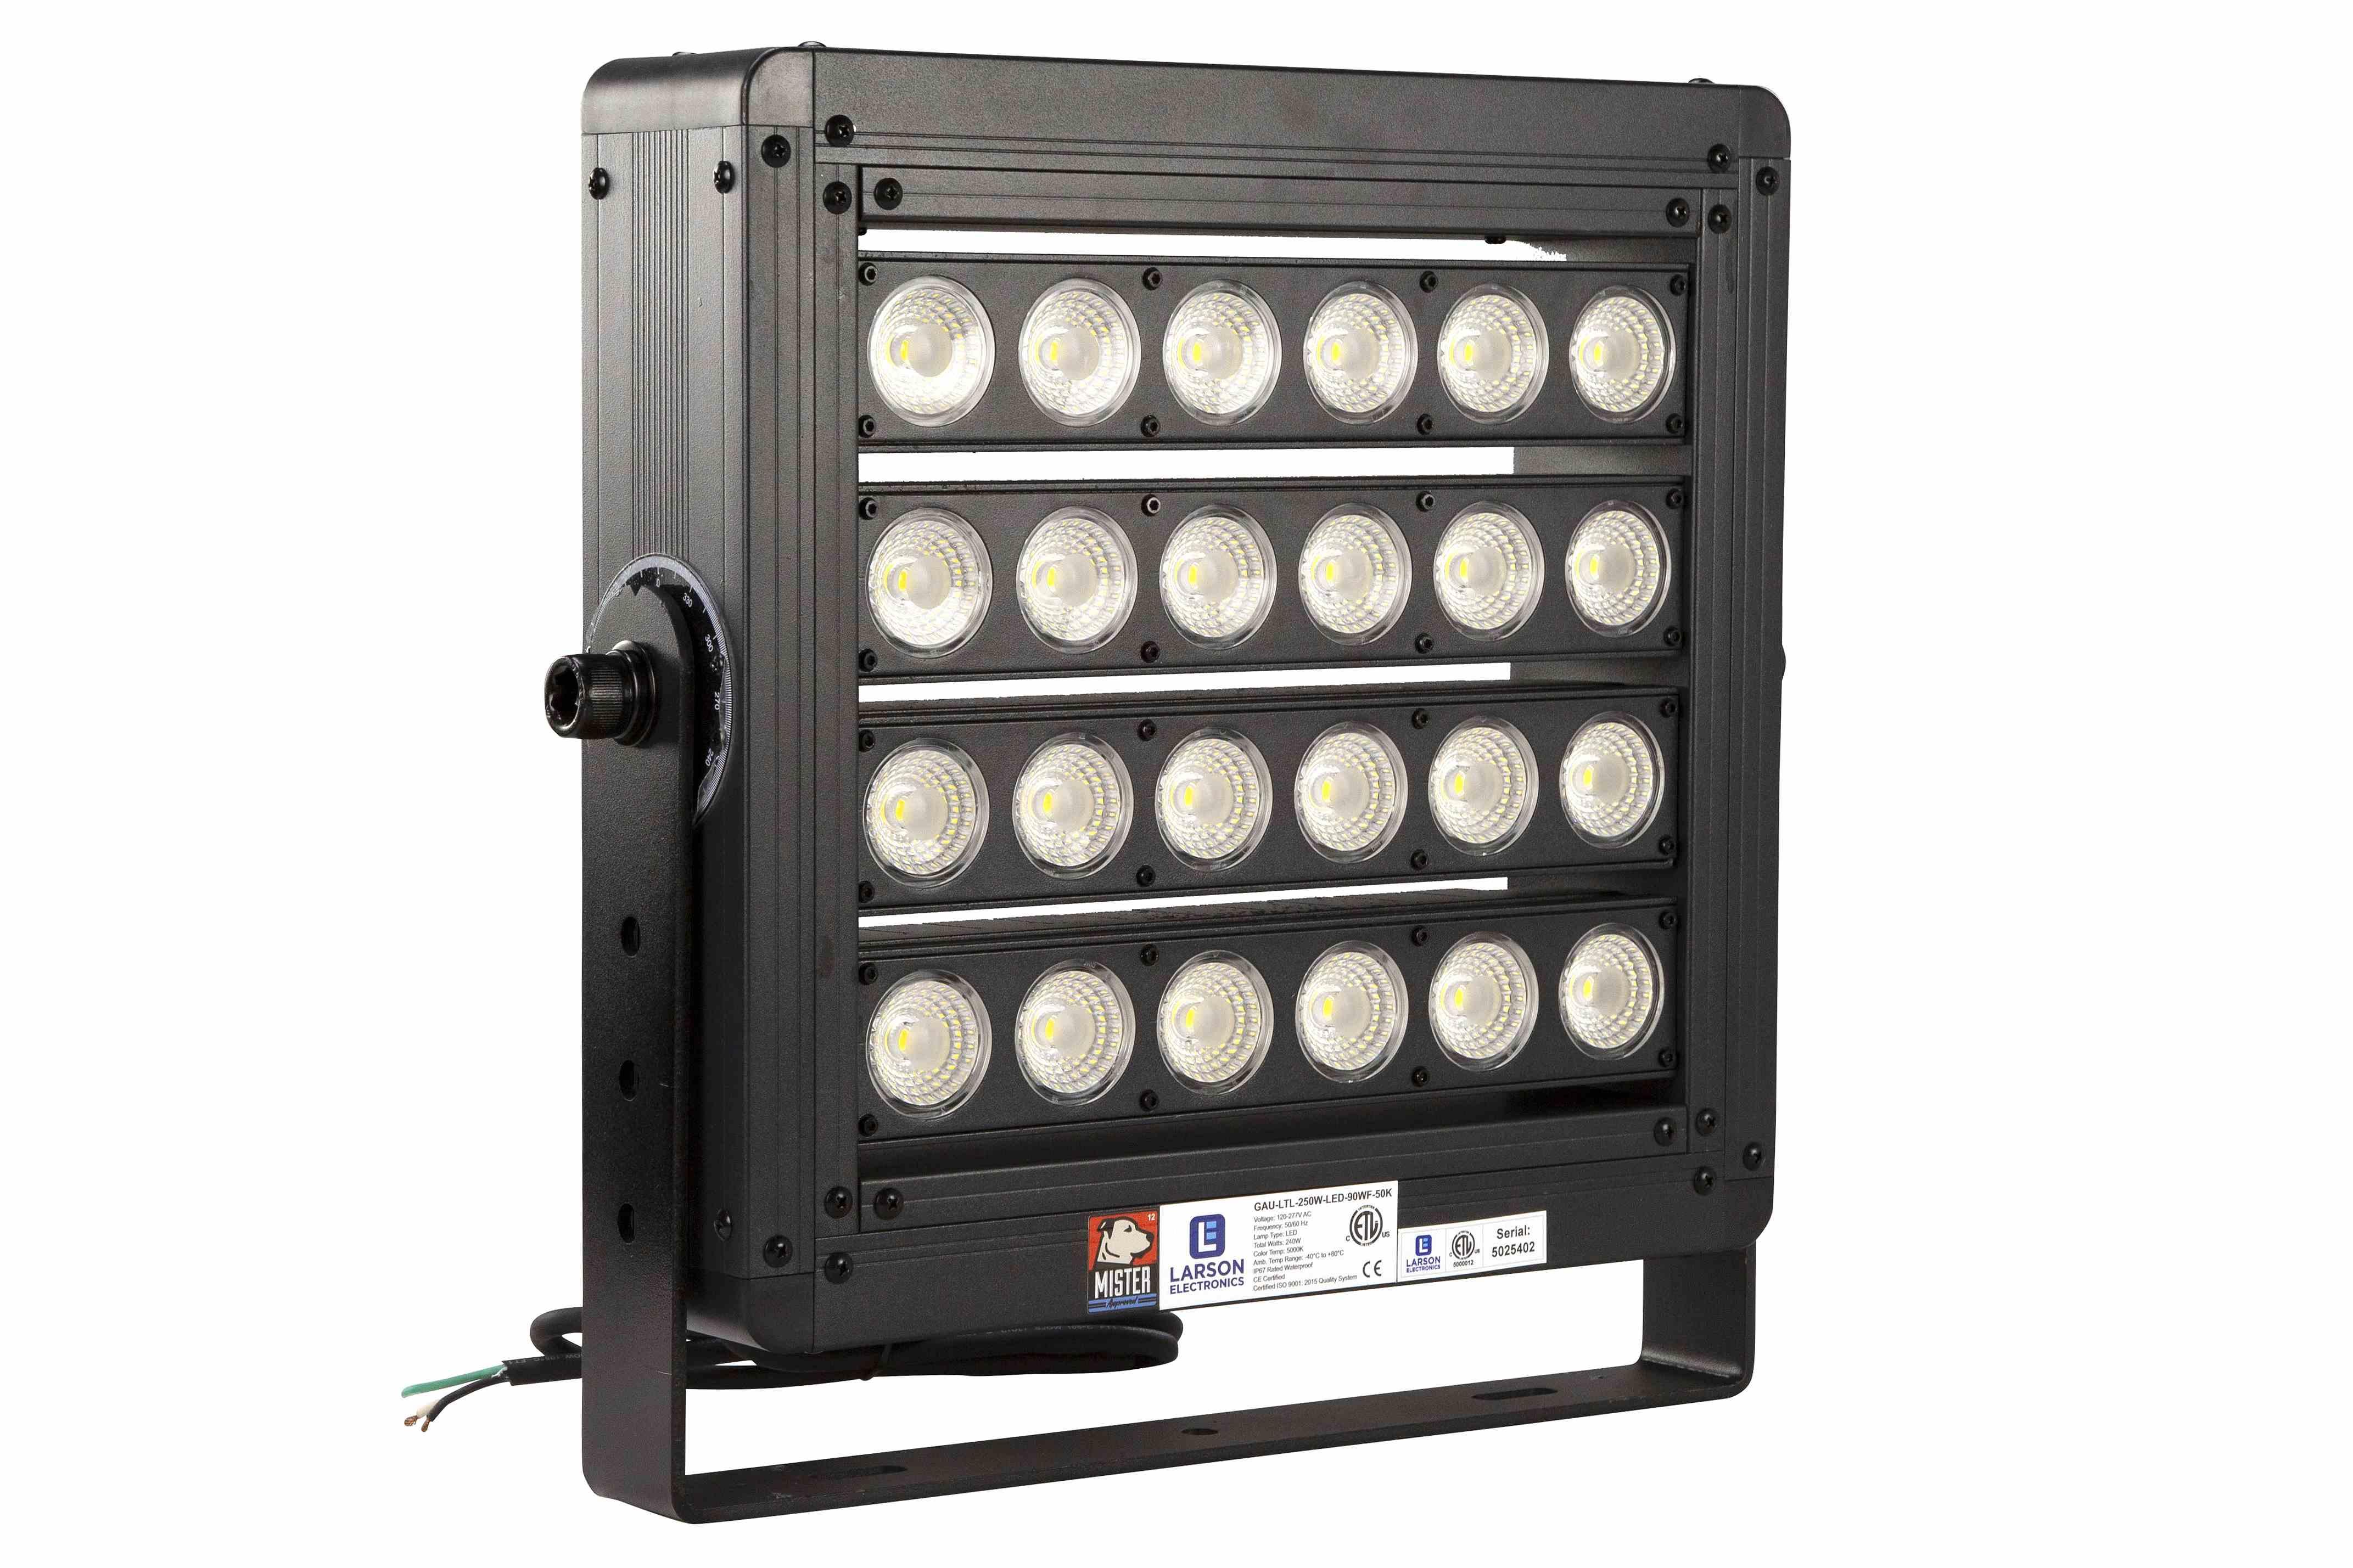 240W High Intensity LED Light